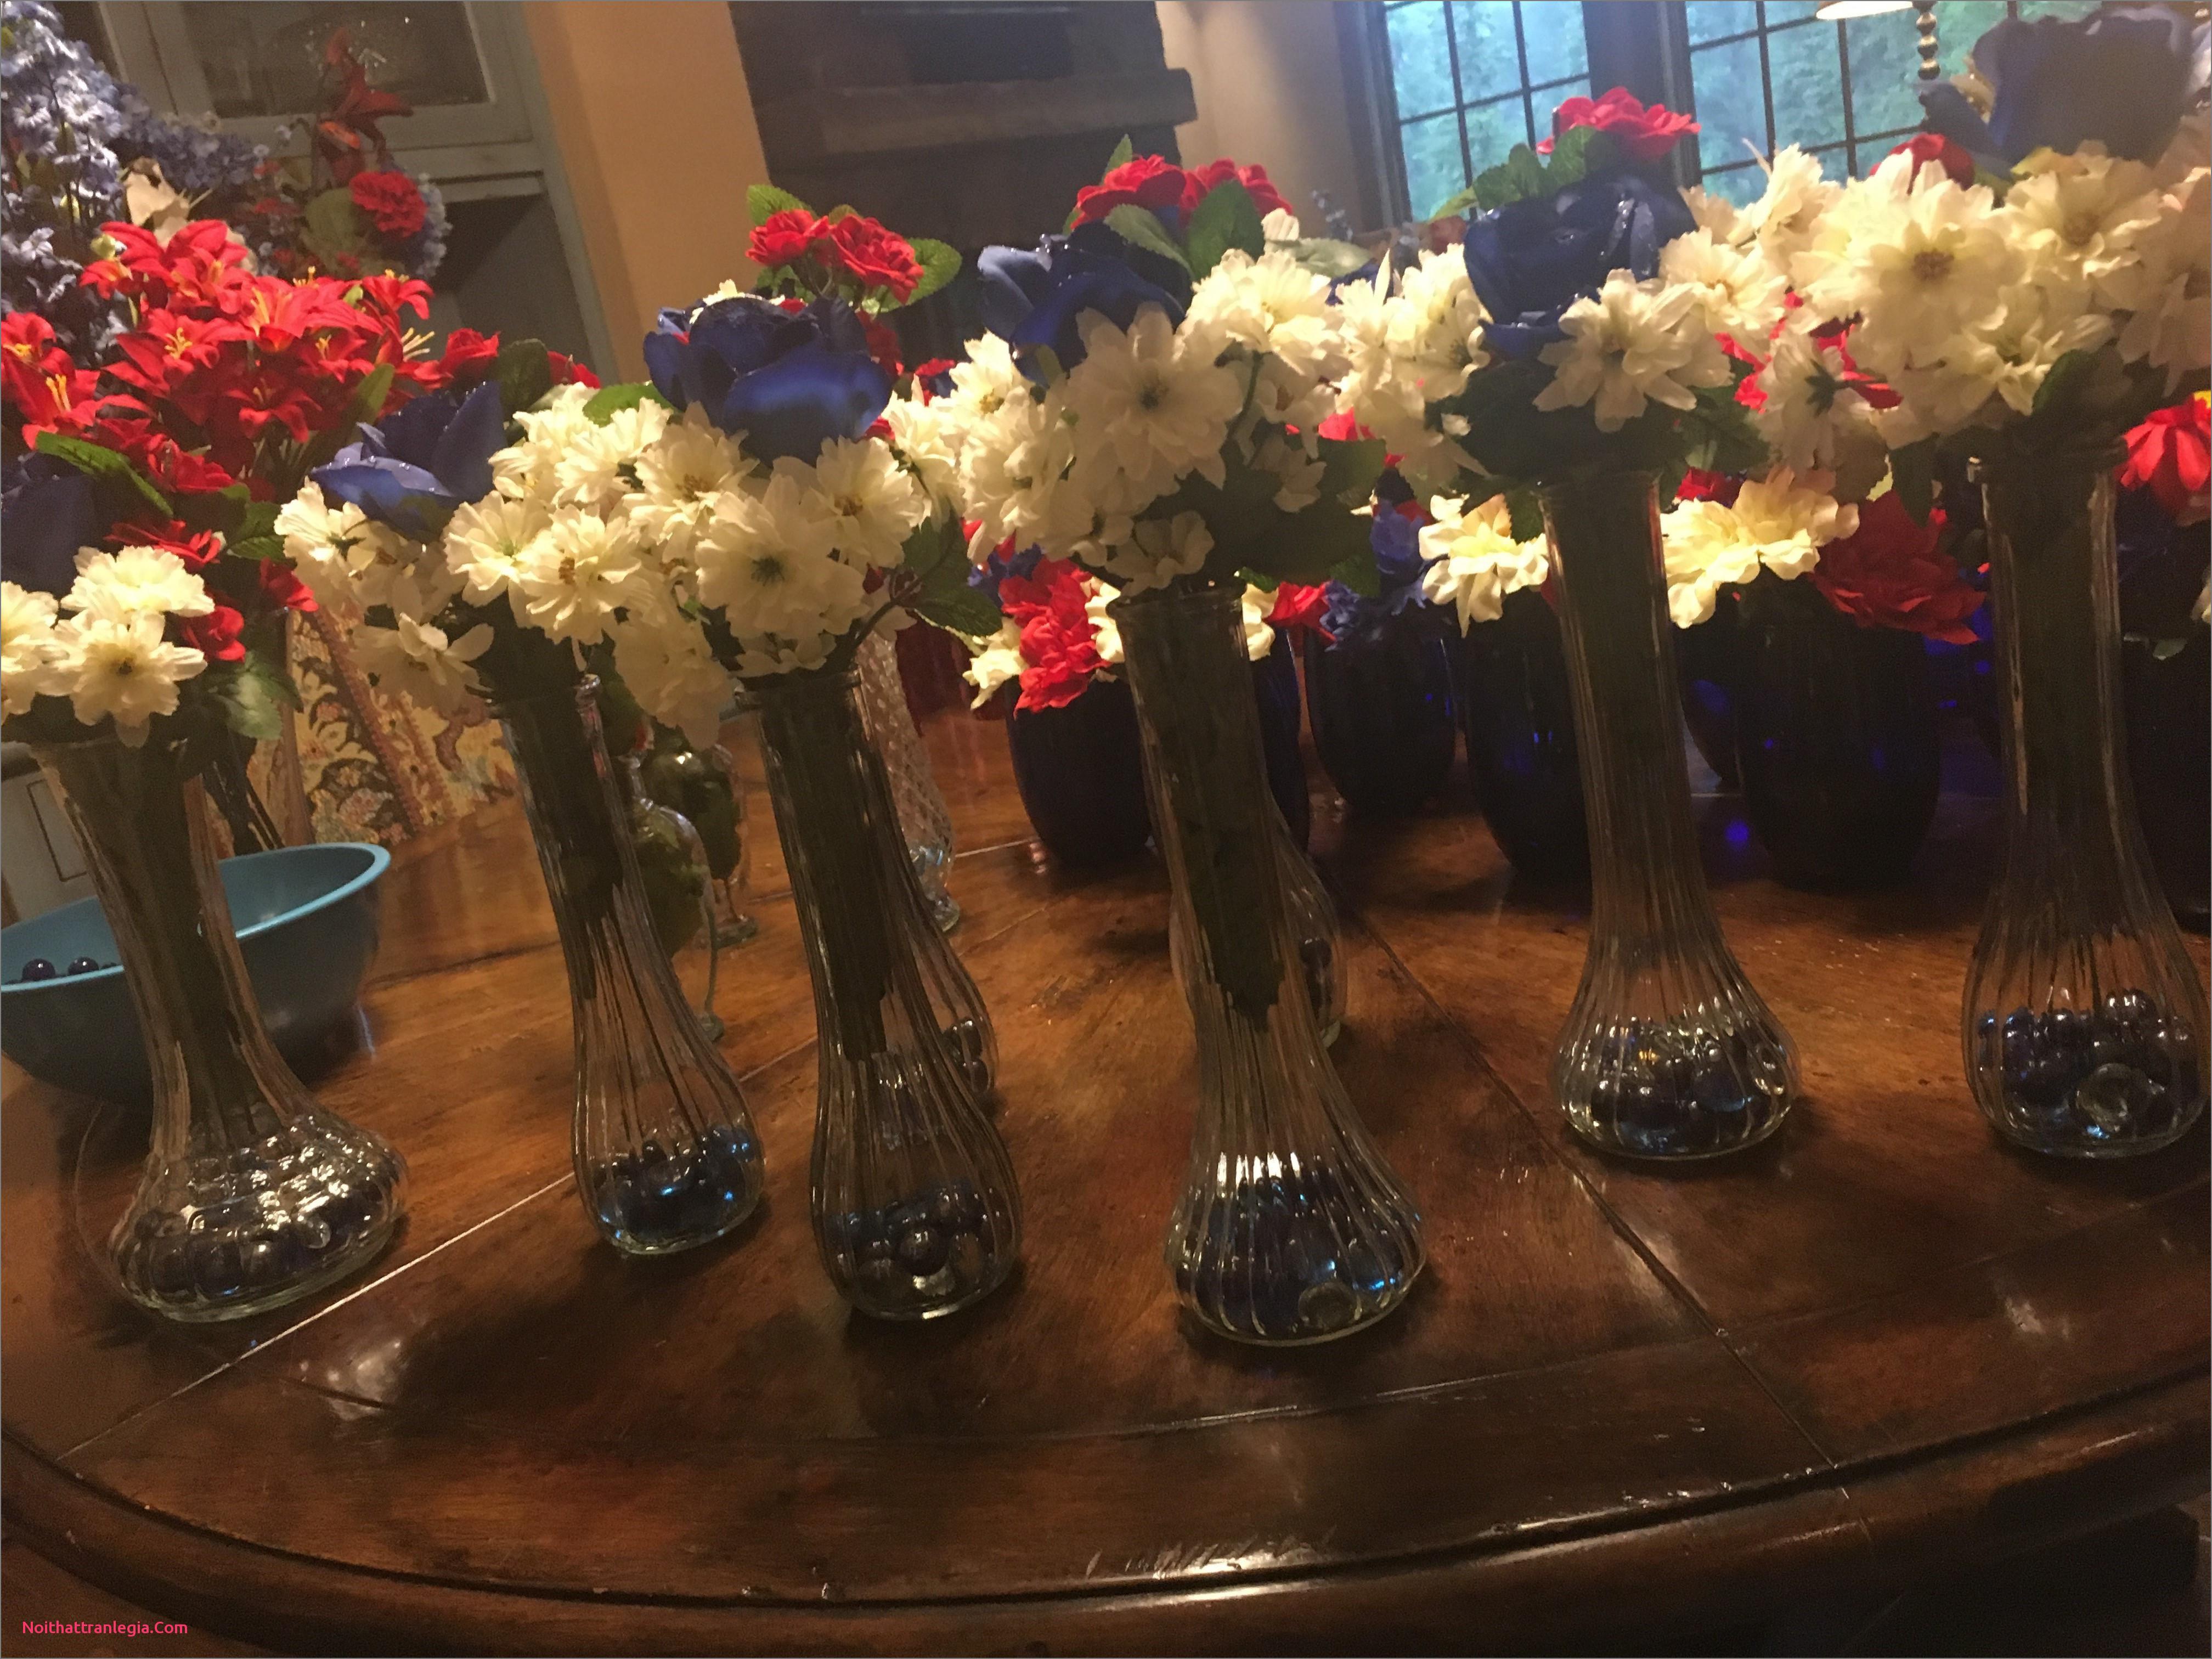 candy vases centerpieces of 20 wedding vases noithattranlegia vases design with regard to decoration line luxury dollar tree wedding decorations awesome h vases dollar vase i 0d